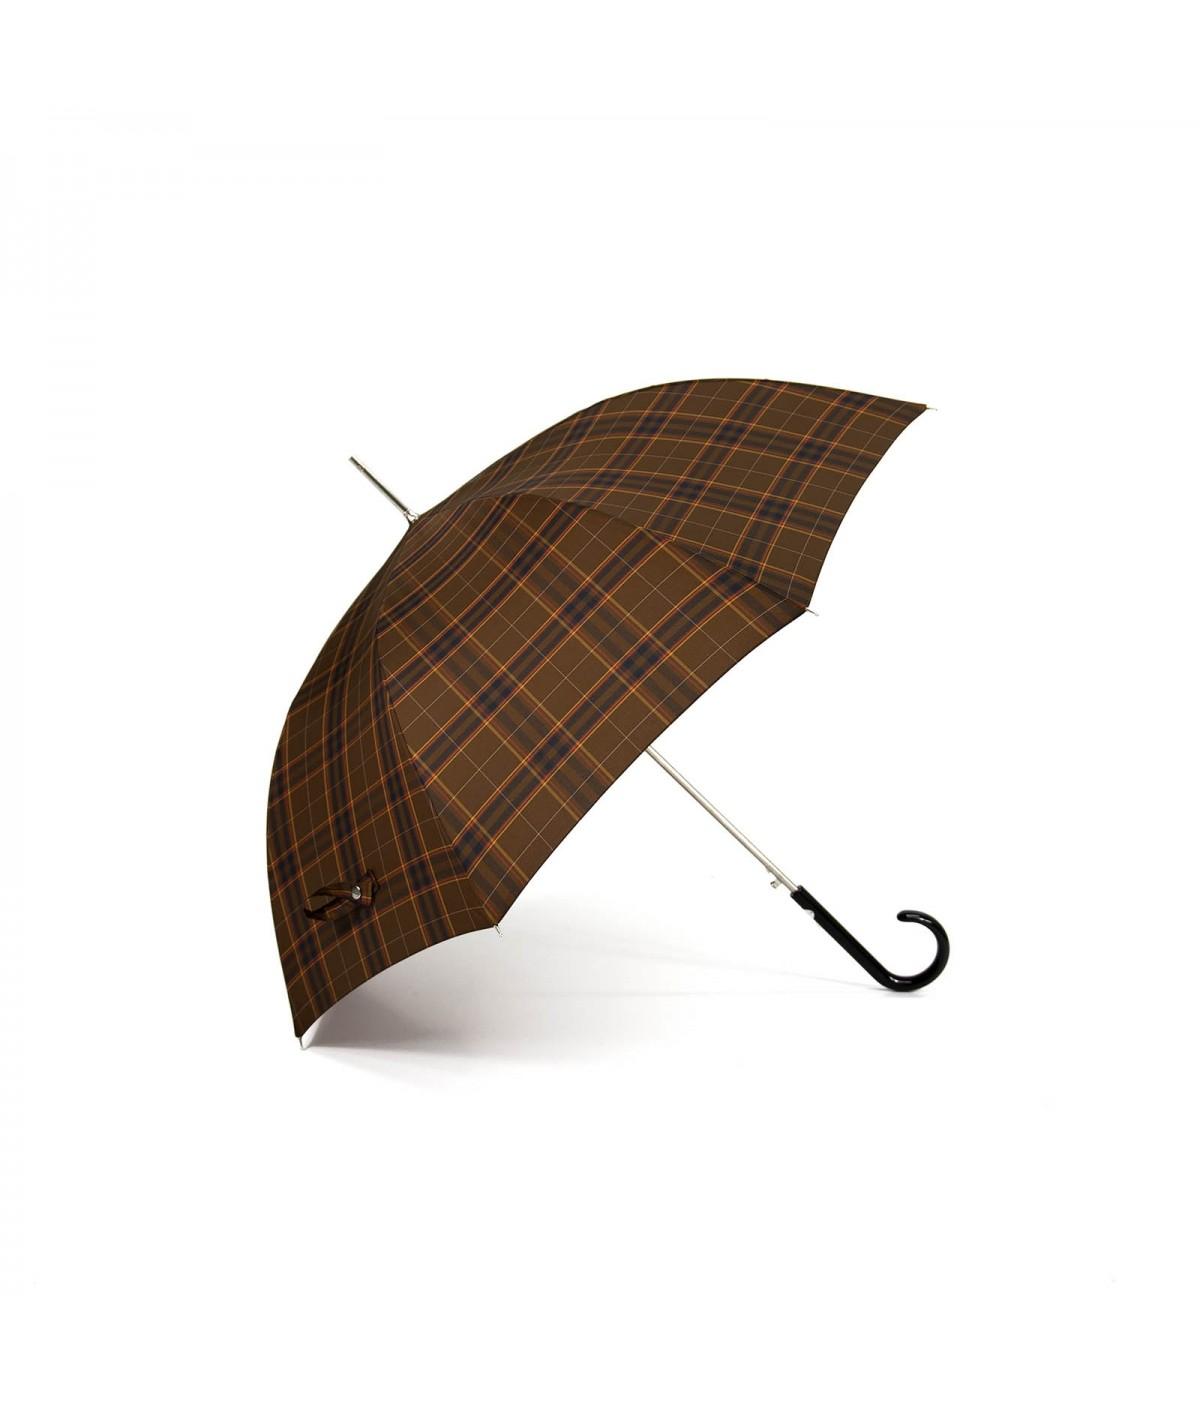 "→ Umbrella ""Scottish"" N°1 Long Automatic - N°6 - Umbrella Manufacturer Maison Pierre Vaux"